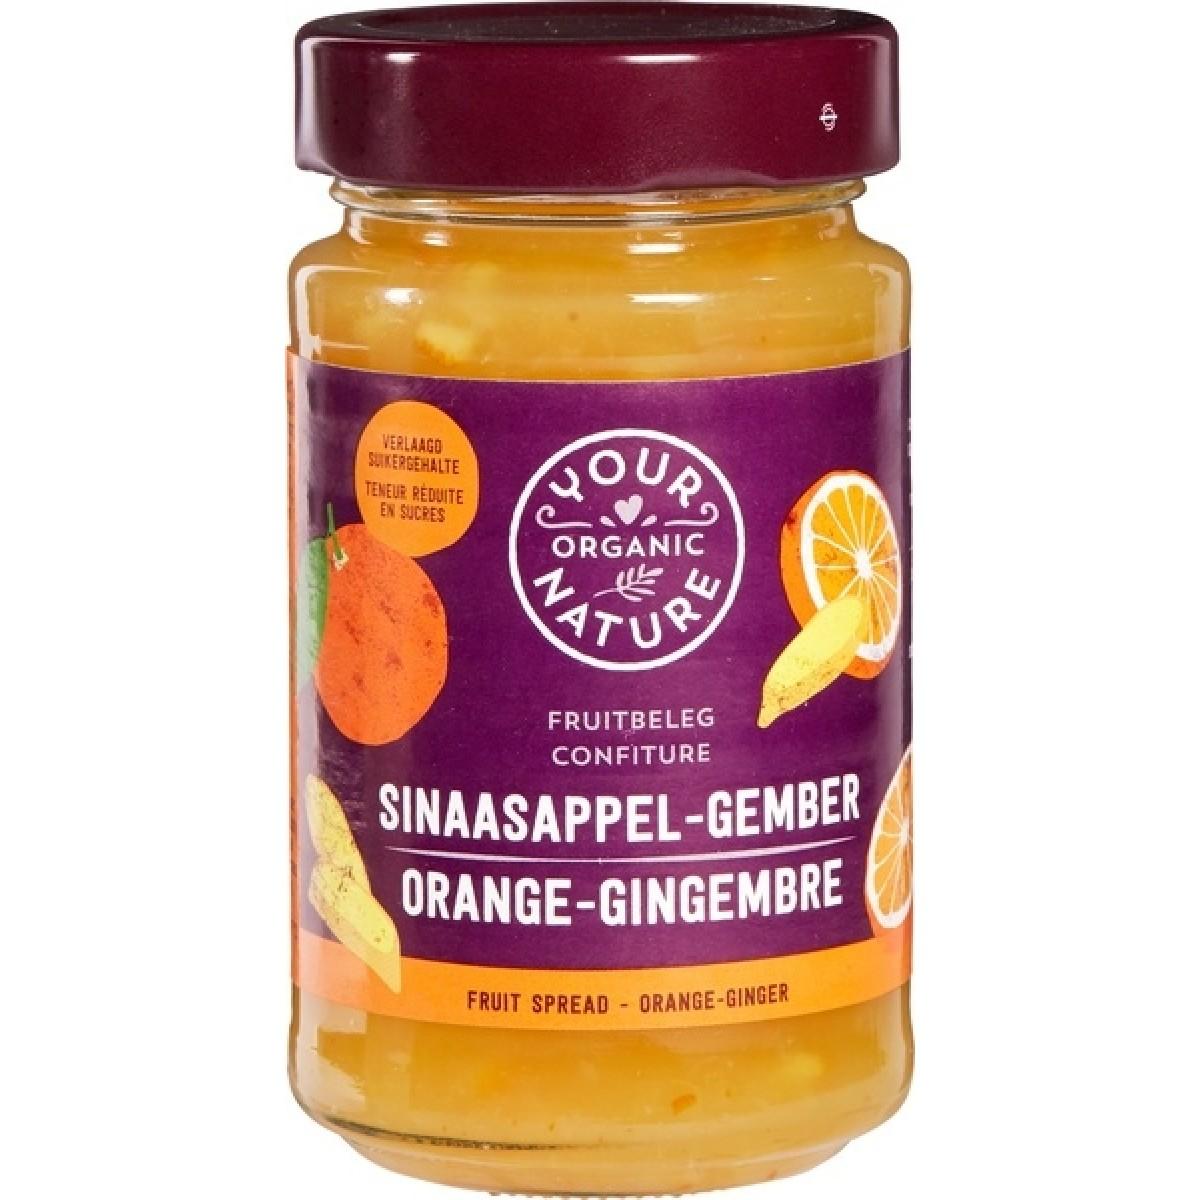 Sinaasappel - Gember Fruitbeleg